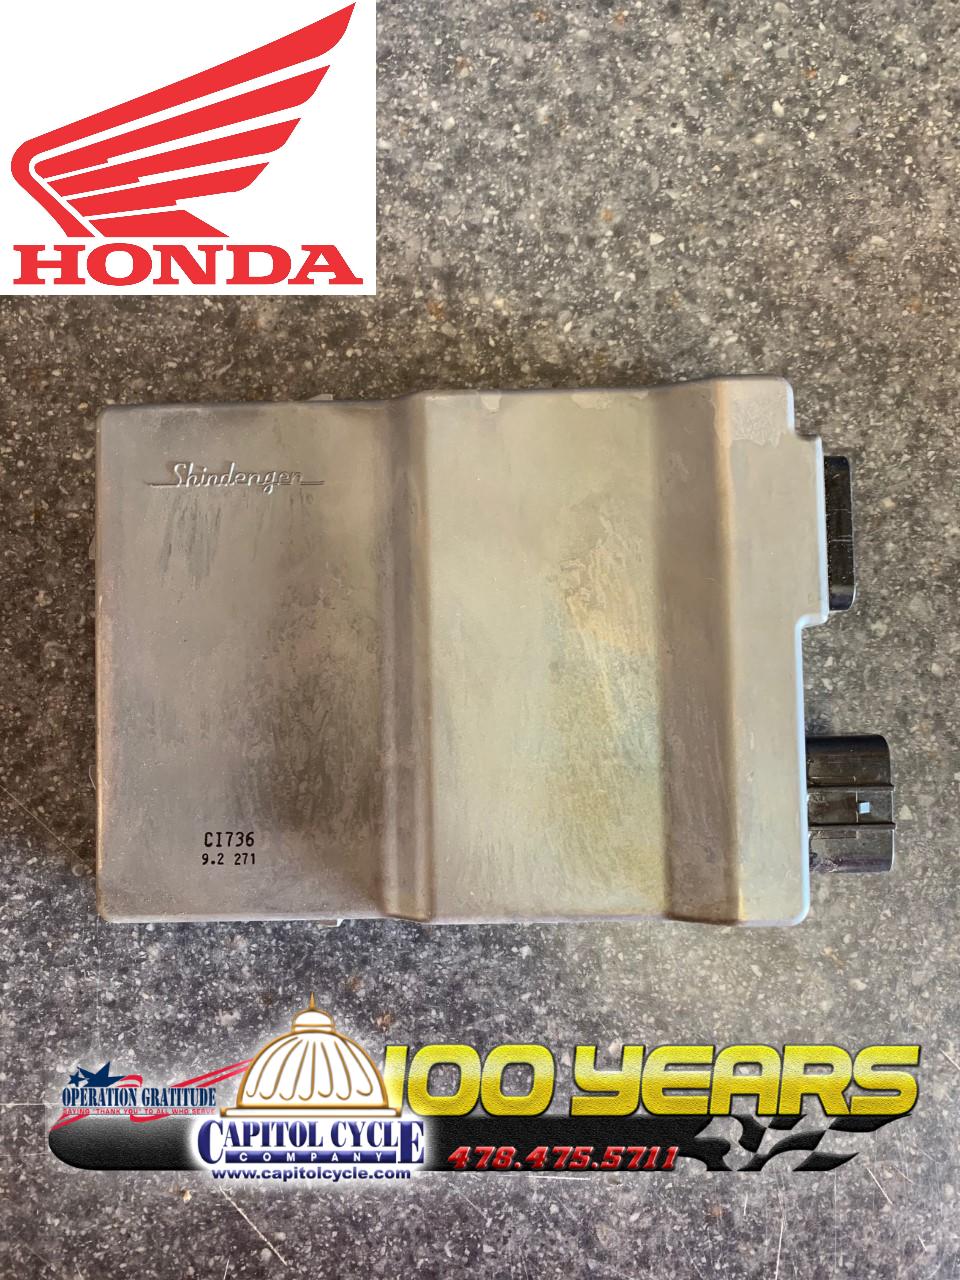 2004 Honda Rubicon 500 Wiring Diagram